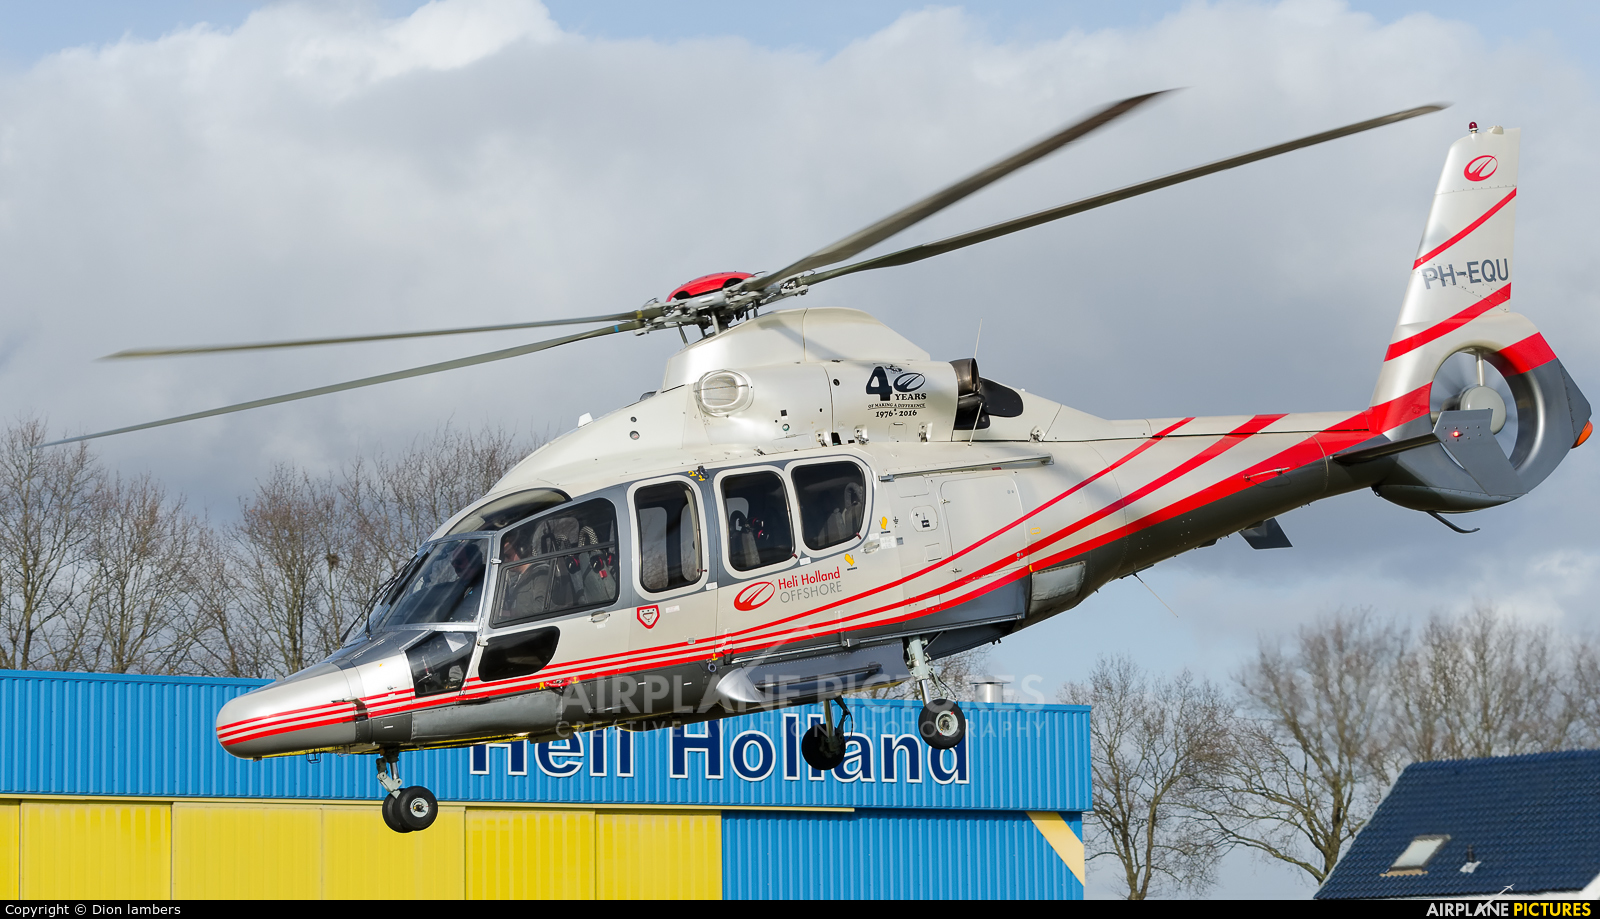 Heli Holland Offshore PH-EQU aircraft at Heli-port Emmen